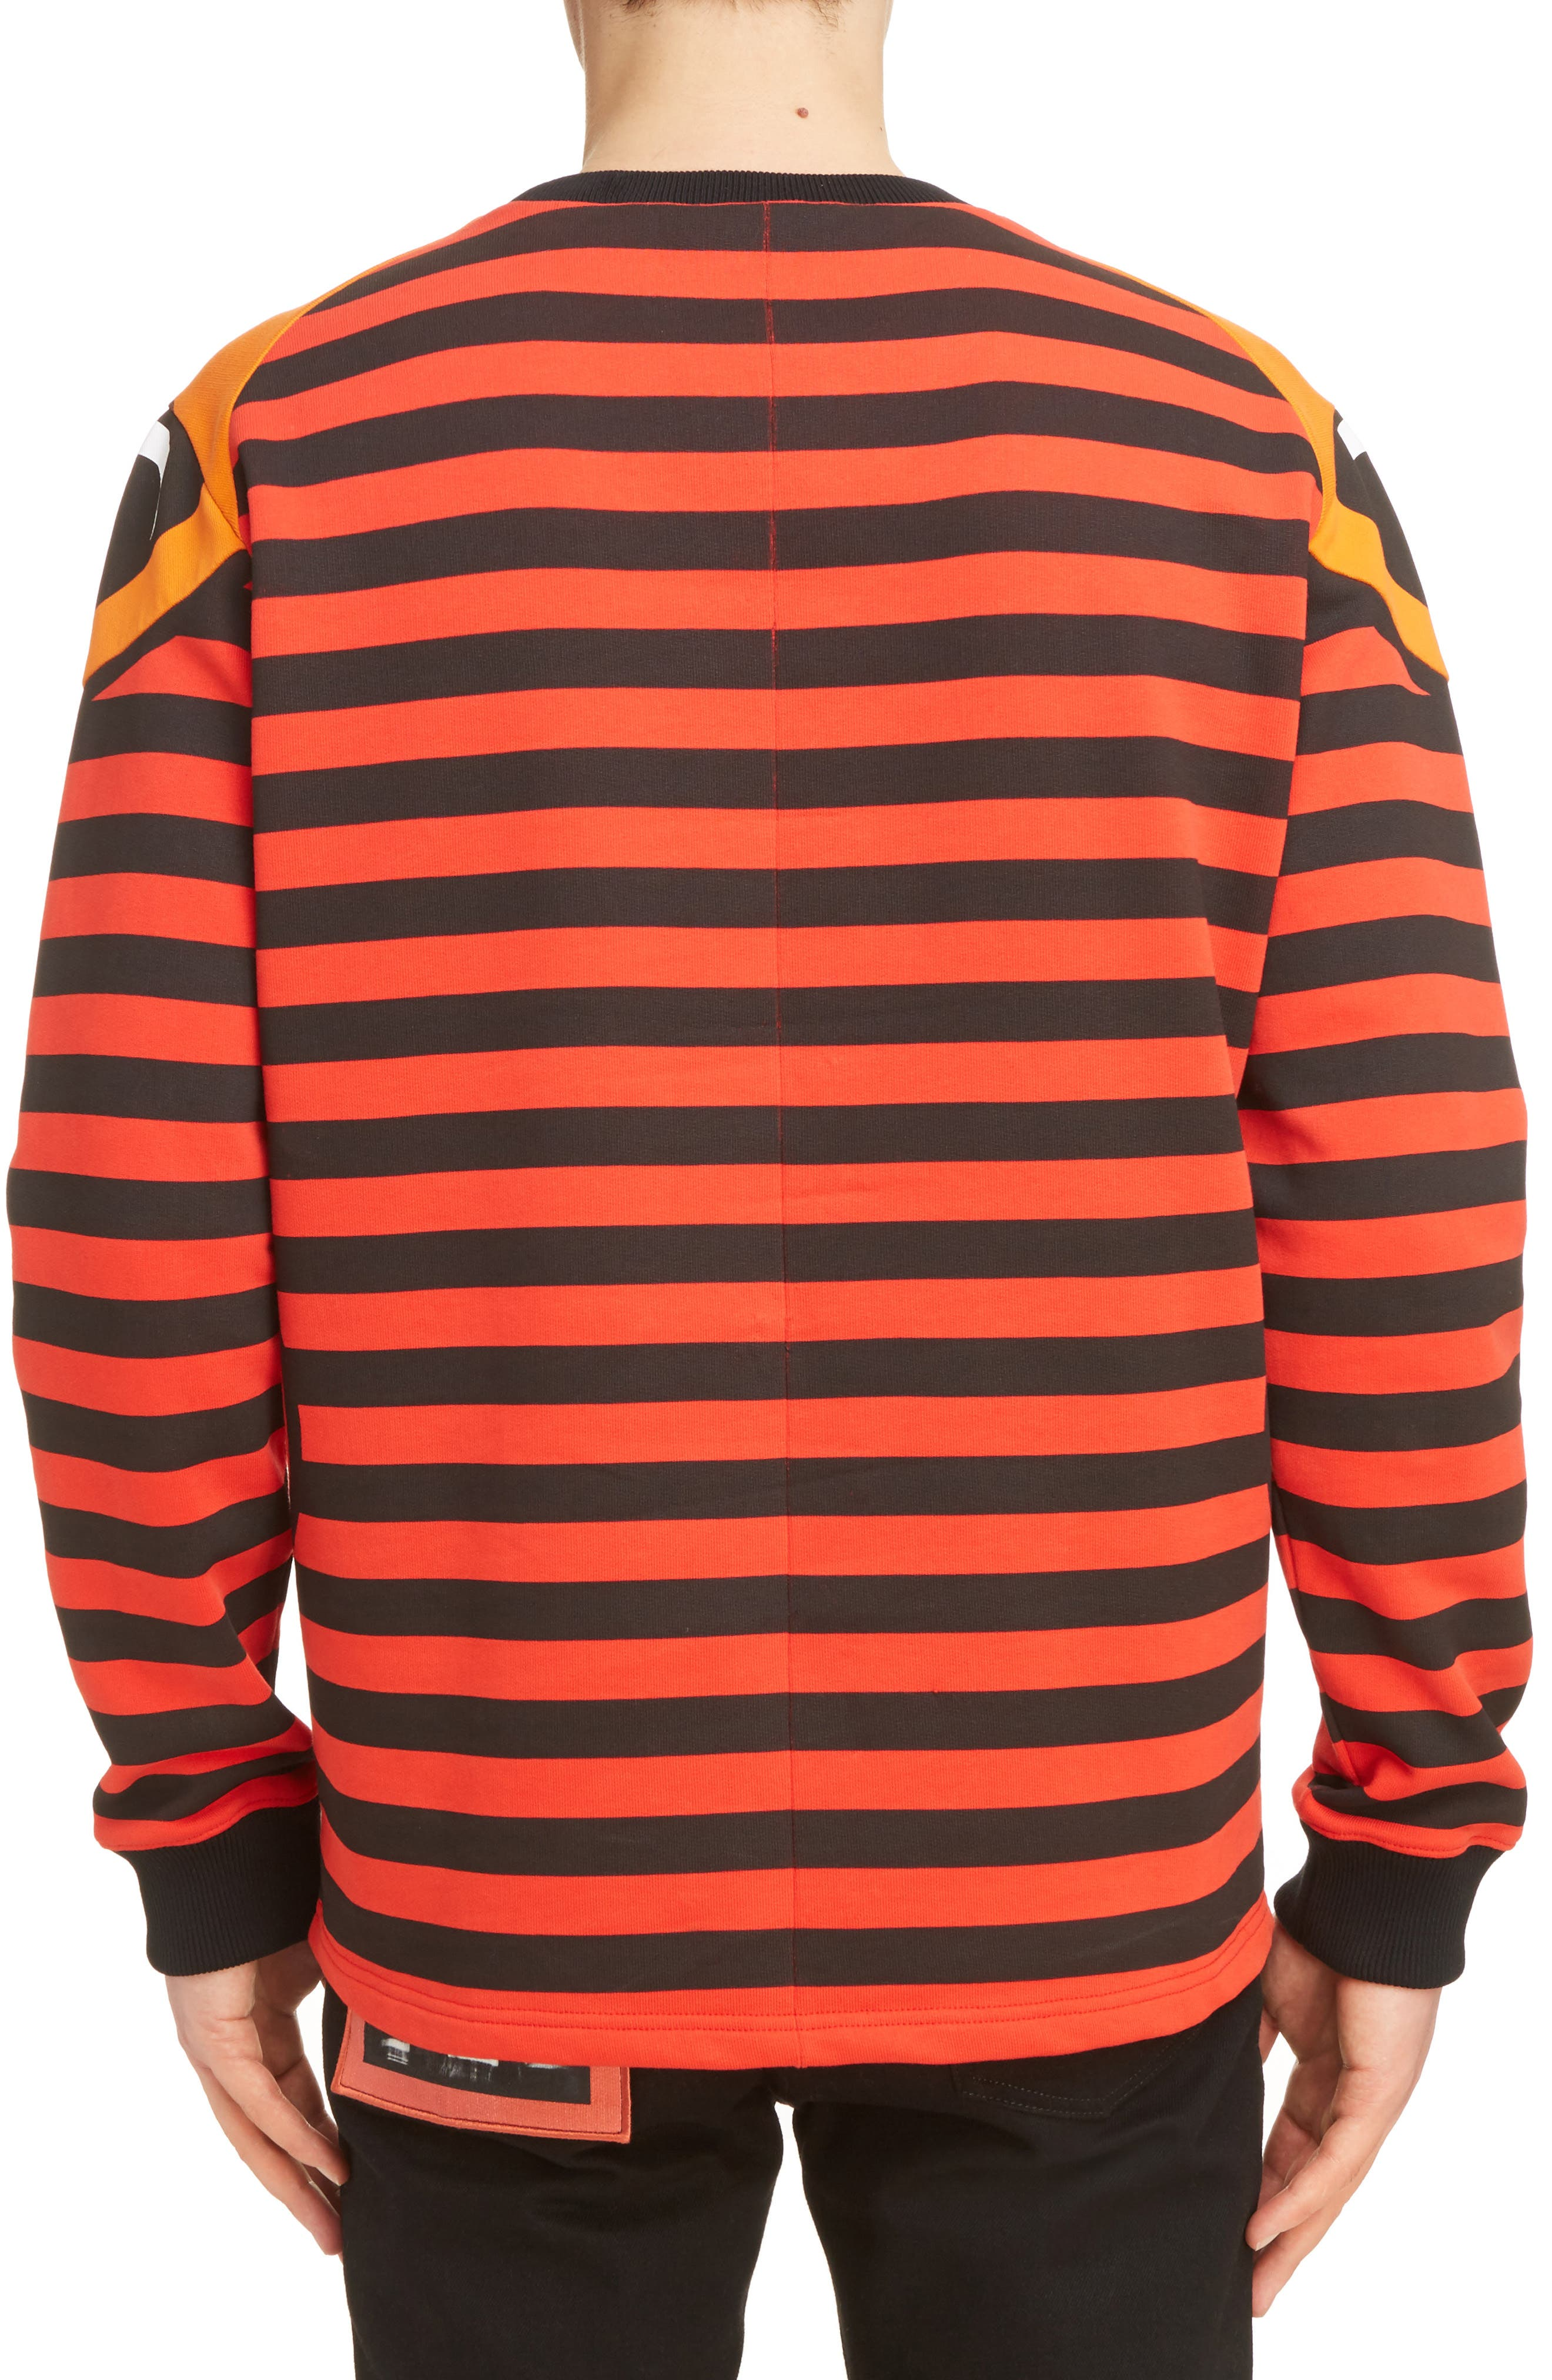 Alternate Image 2  - Givenchy Runway Totem Sweatshirt